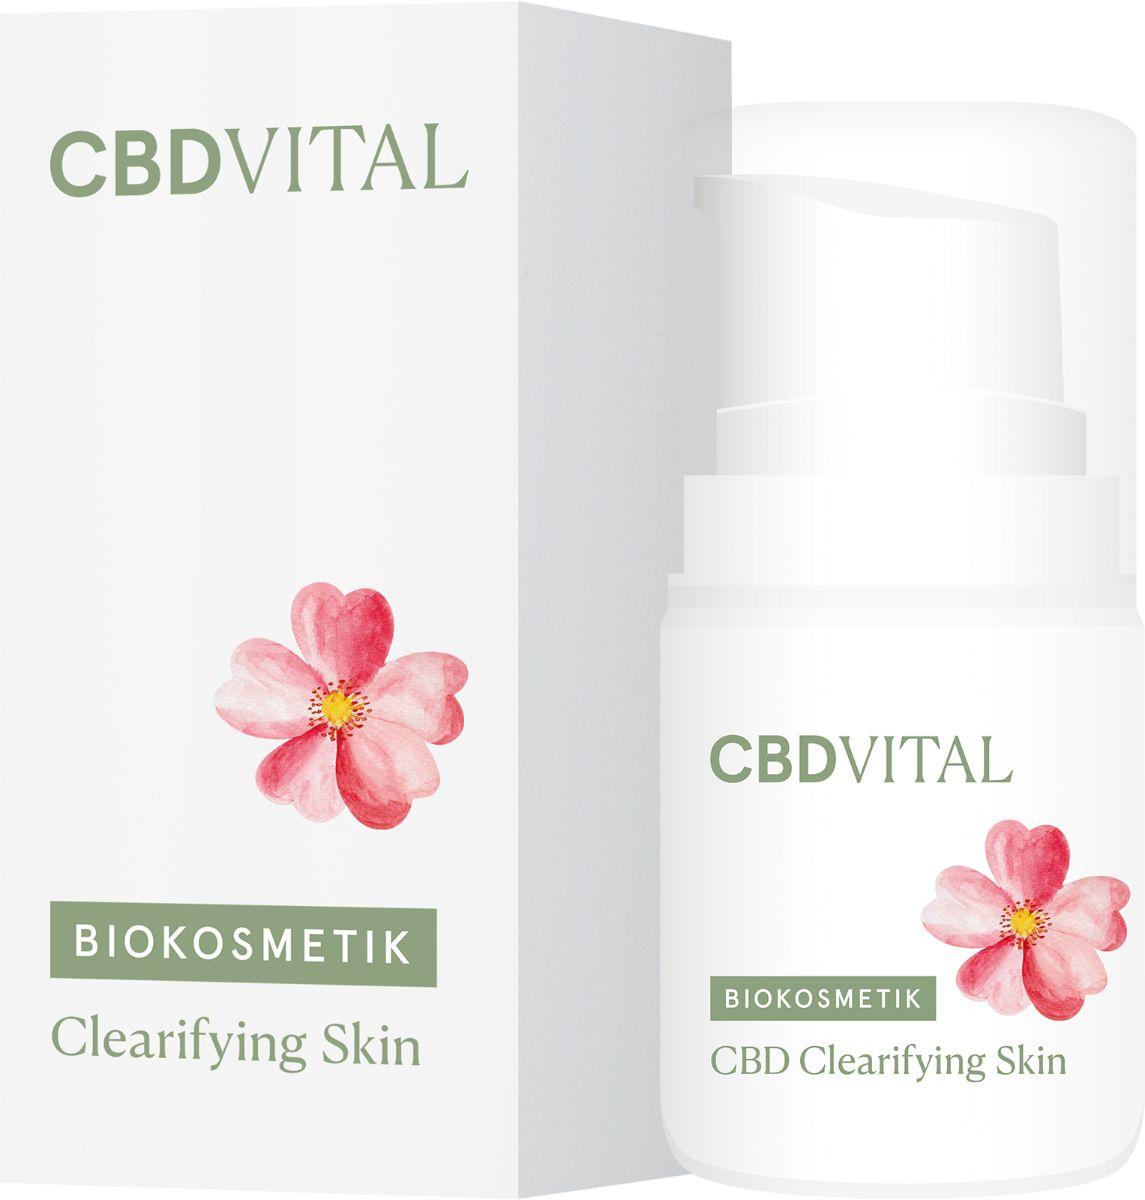 CBD-Vital CBD Clearifying Skin